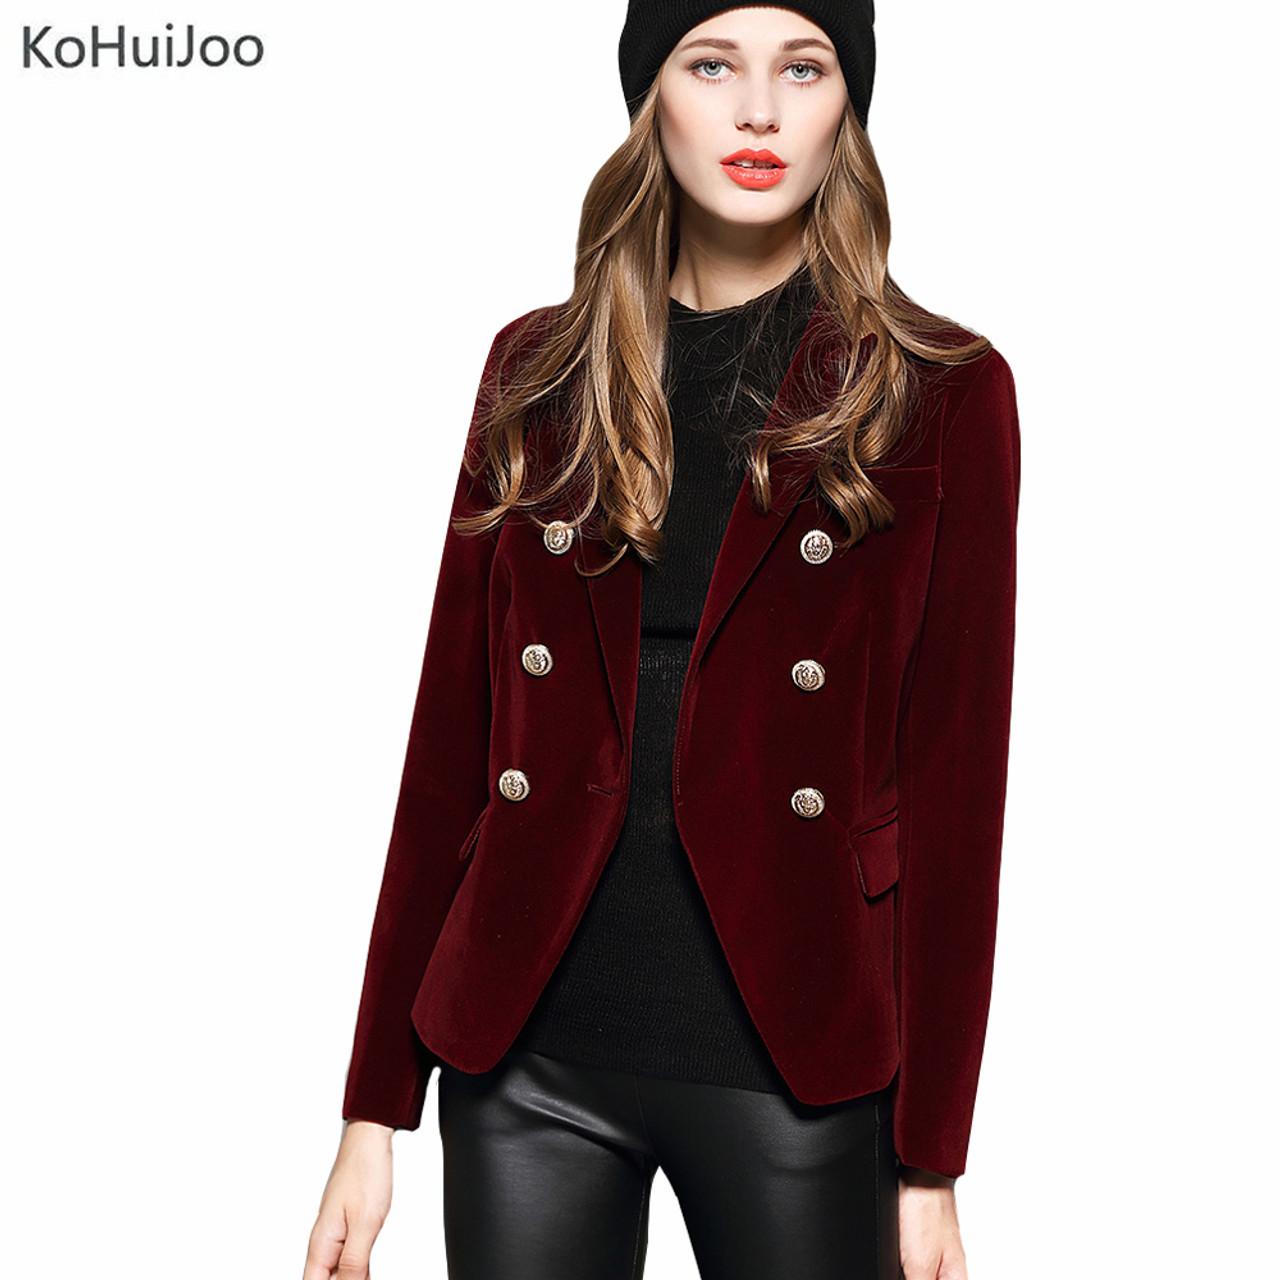 23bf56865a69 KoHuiJoo 2019 Autumn Winter Women's Blazers Long Sleeve Golden Button Slim  Lady Velvet Jackets and Coats Black Wine Red M-2XL - OnshopDeals.Com